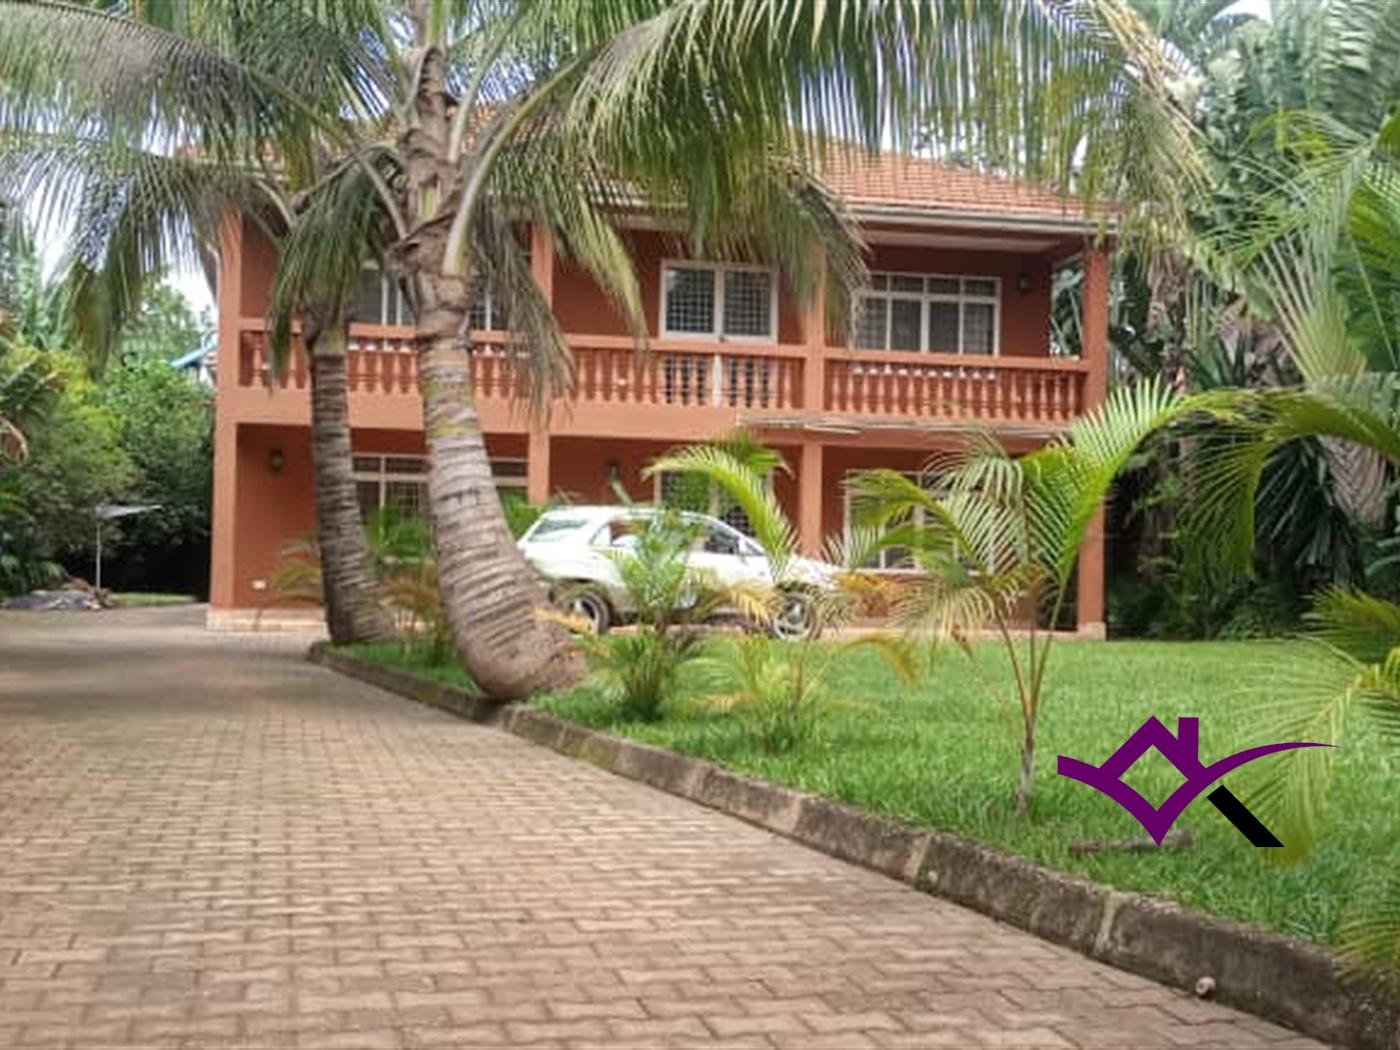 Storeyed house for sale in Muyenga Kampala